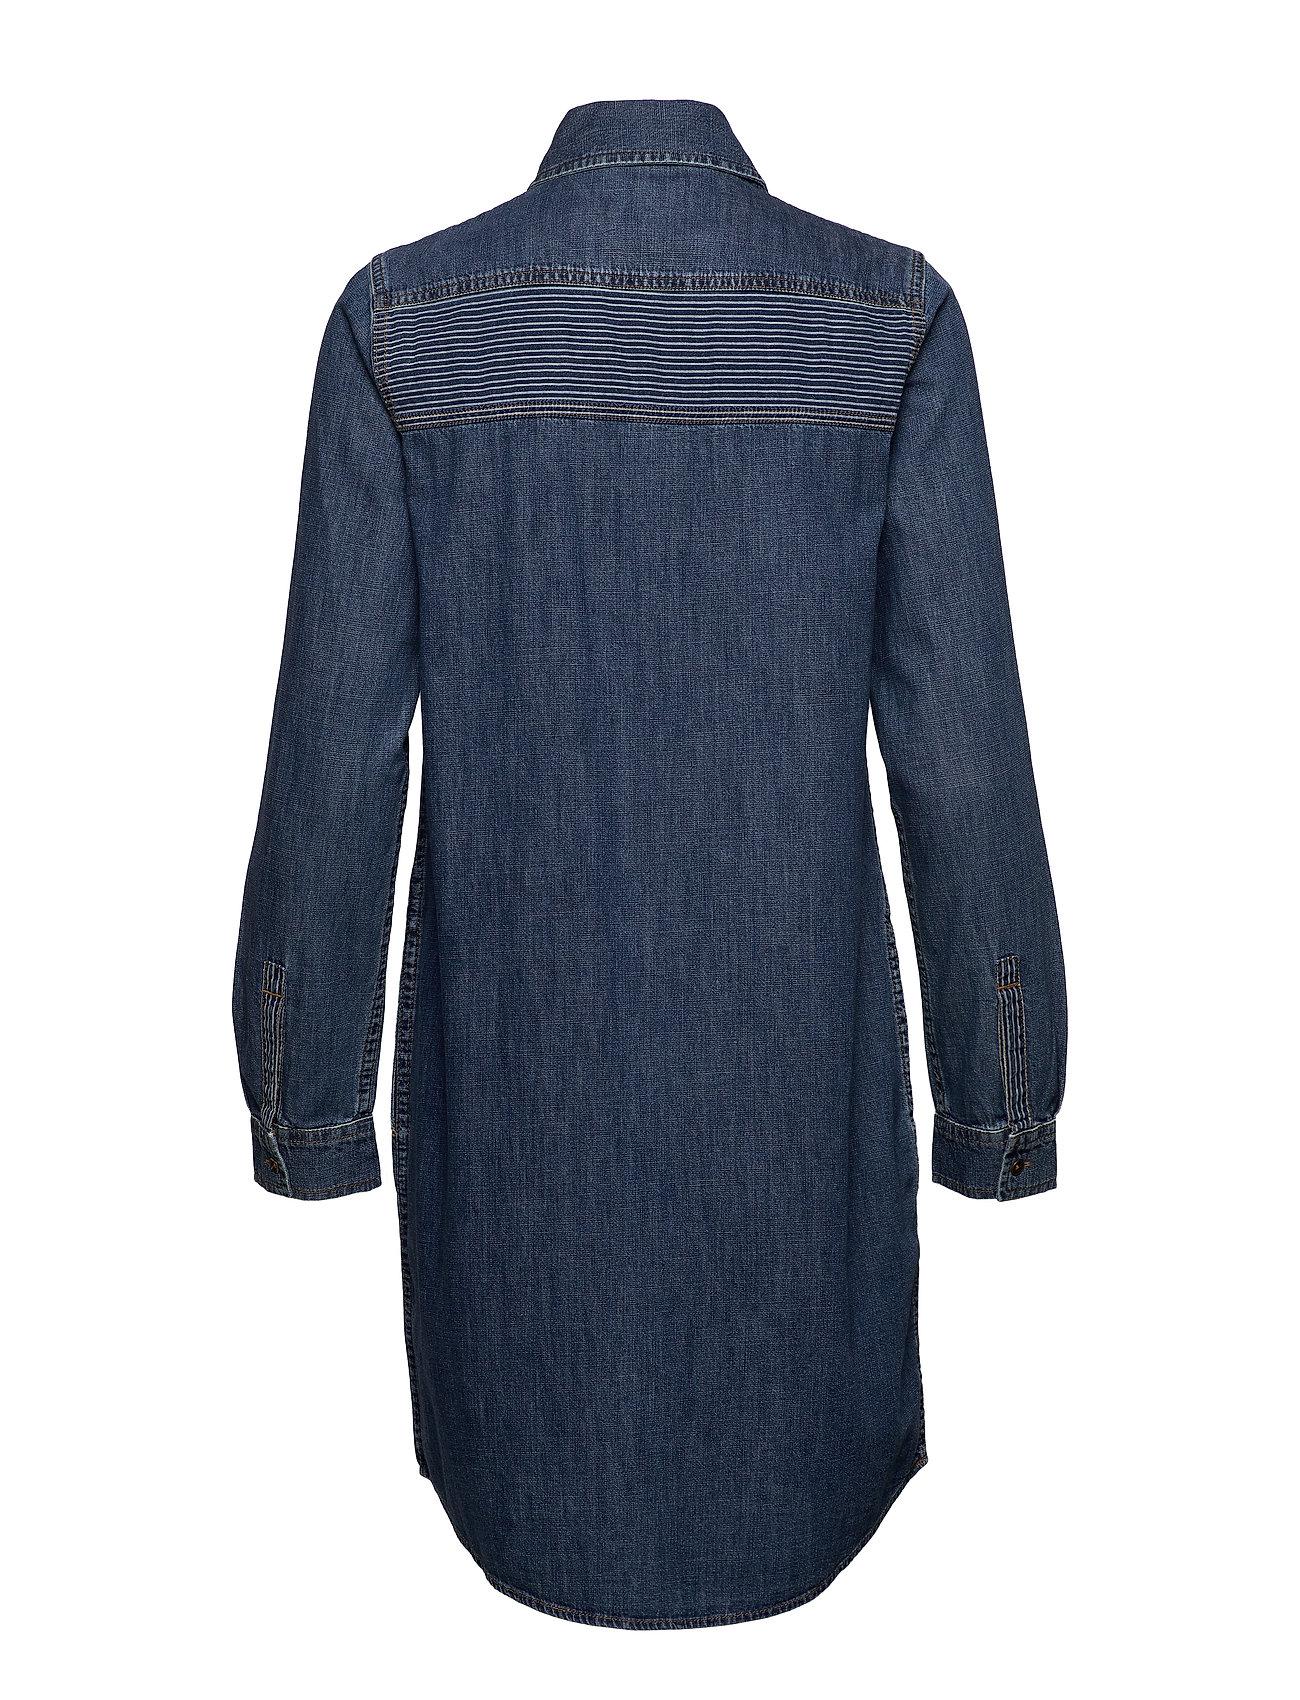 WashEdc By Esprit Dresses Denimblue Medium OPXTZiuwk